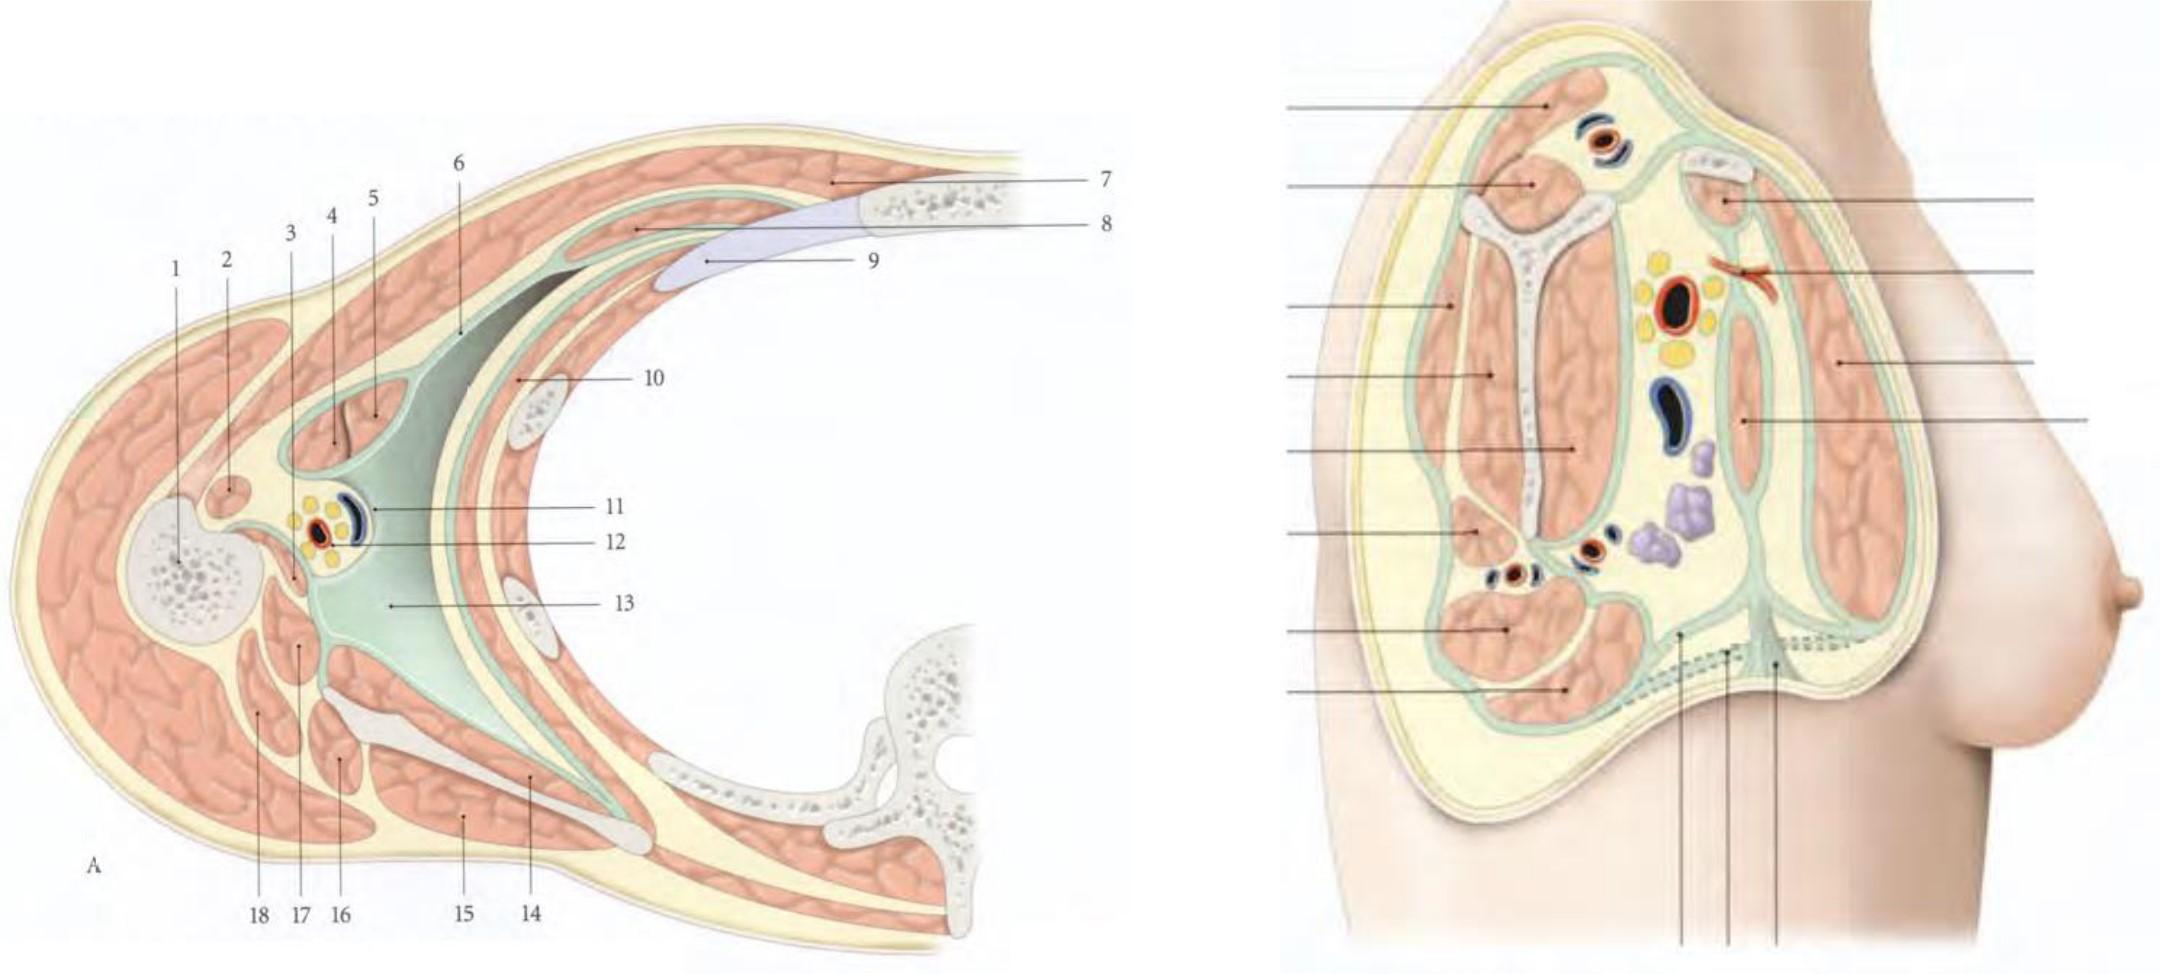 Groupe musculaire antérieur, Groupe musculaire postérieur, Groupe musculaire latéral, Groupe musculaire médial